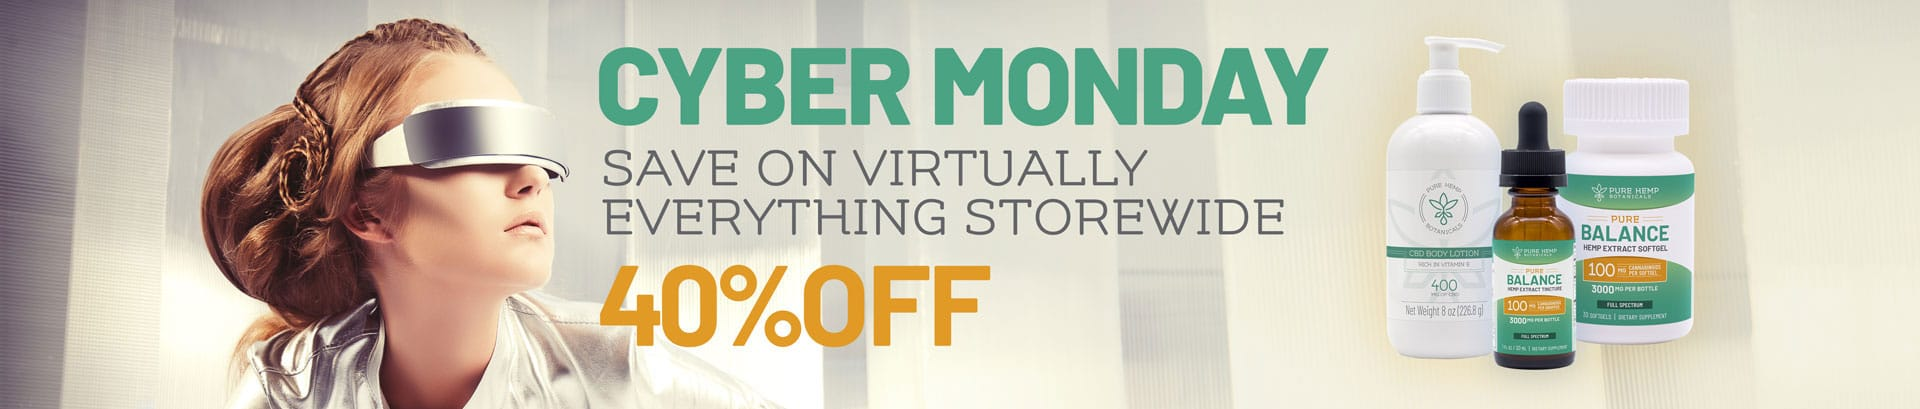 CBD Cyber Monday Sale